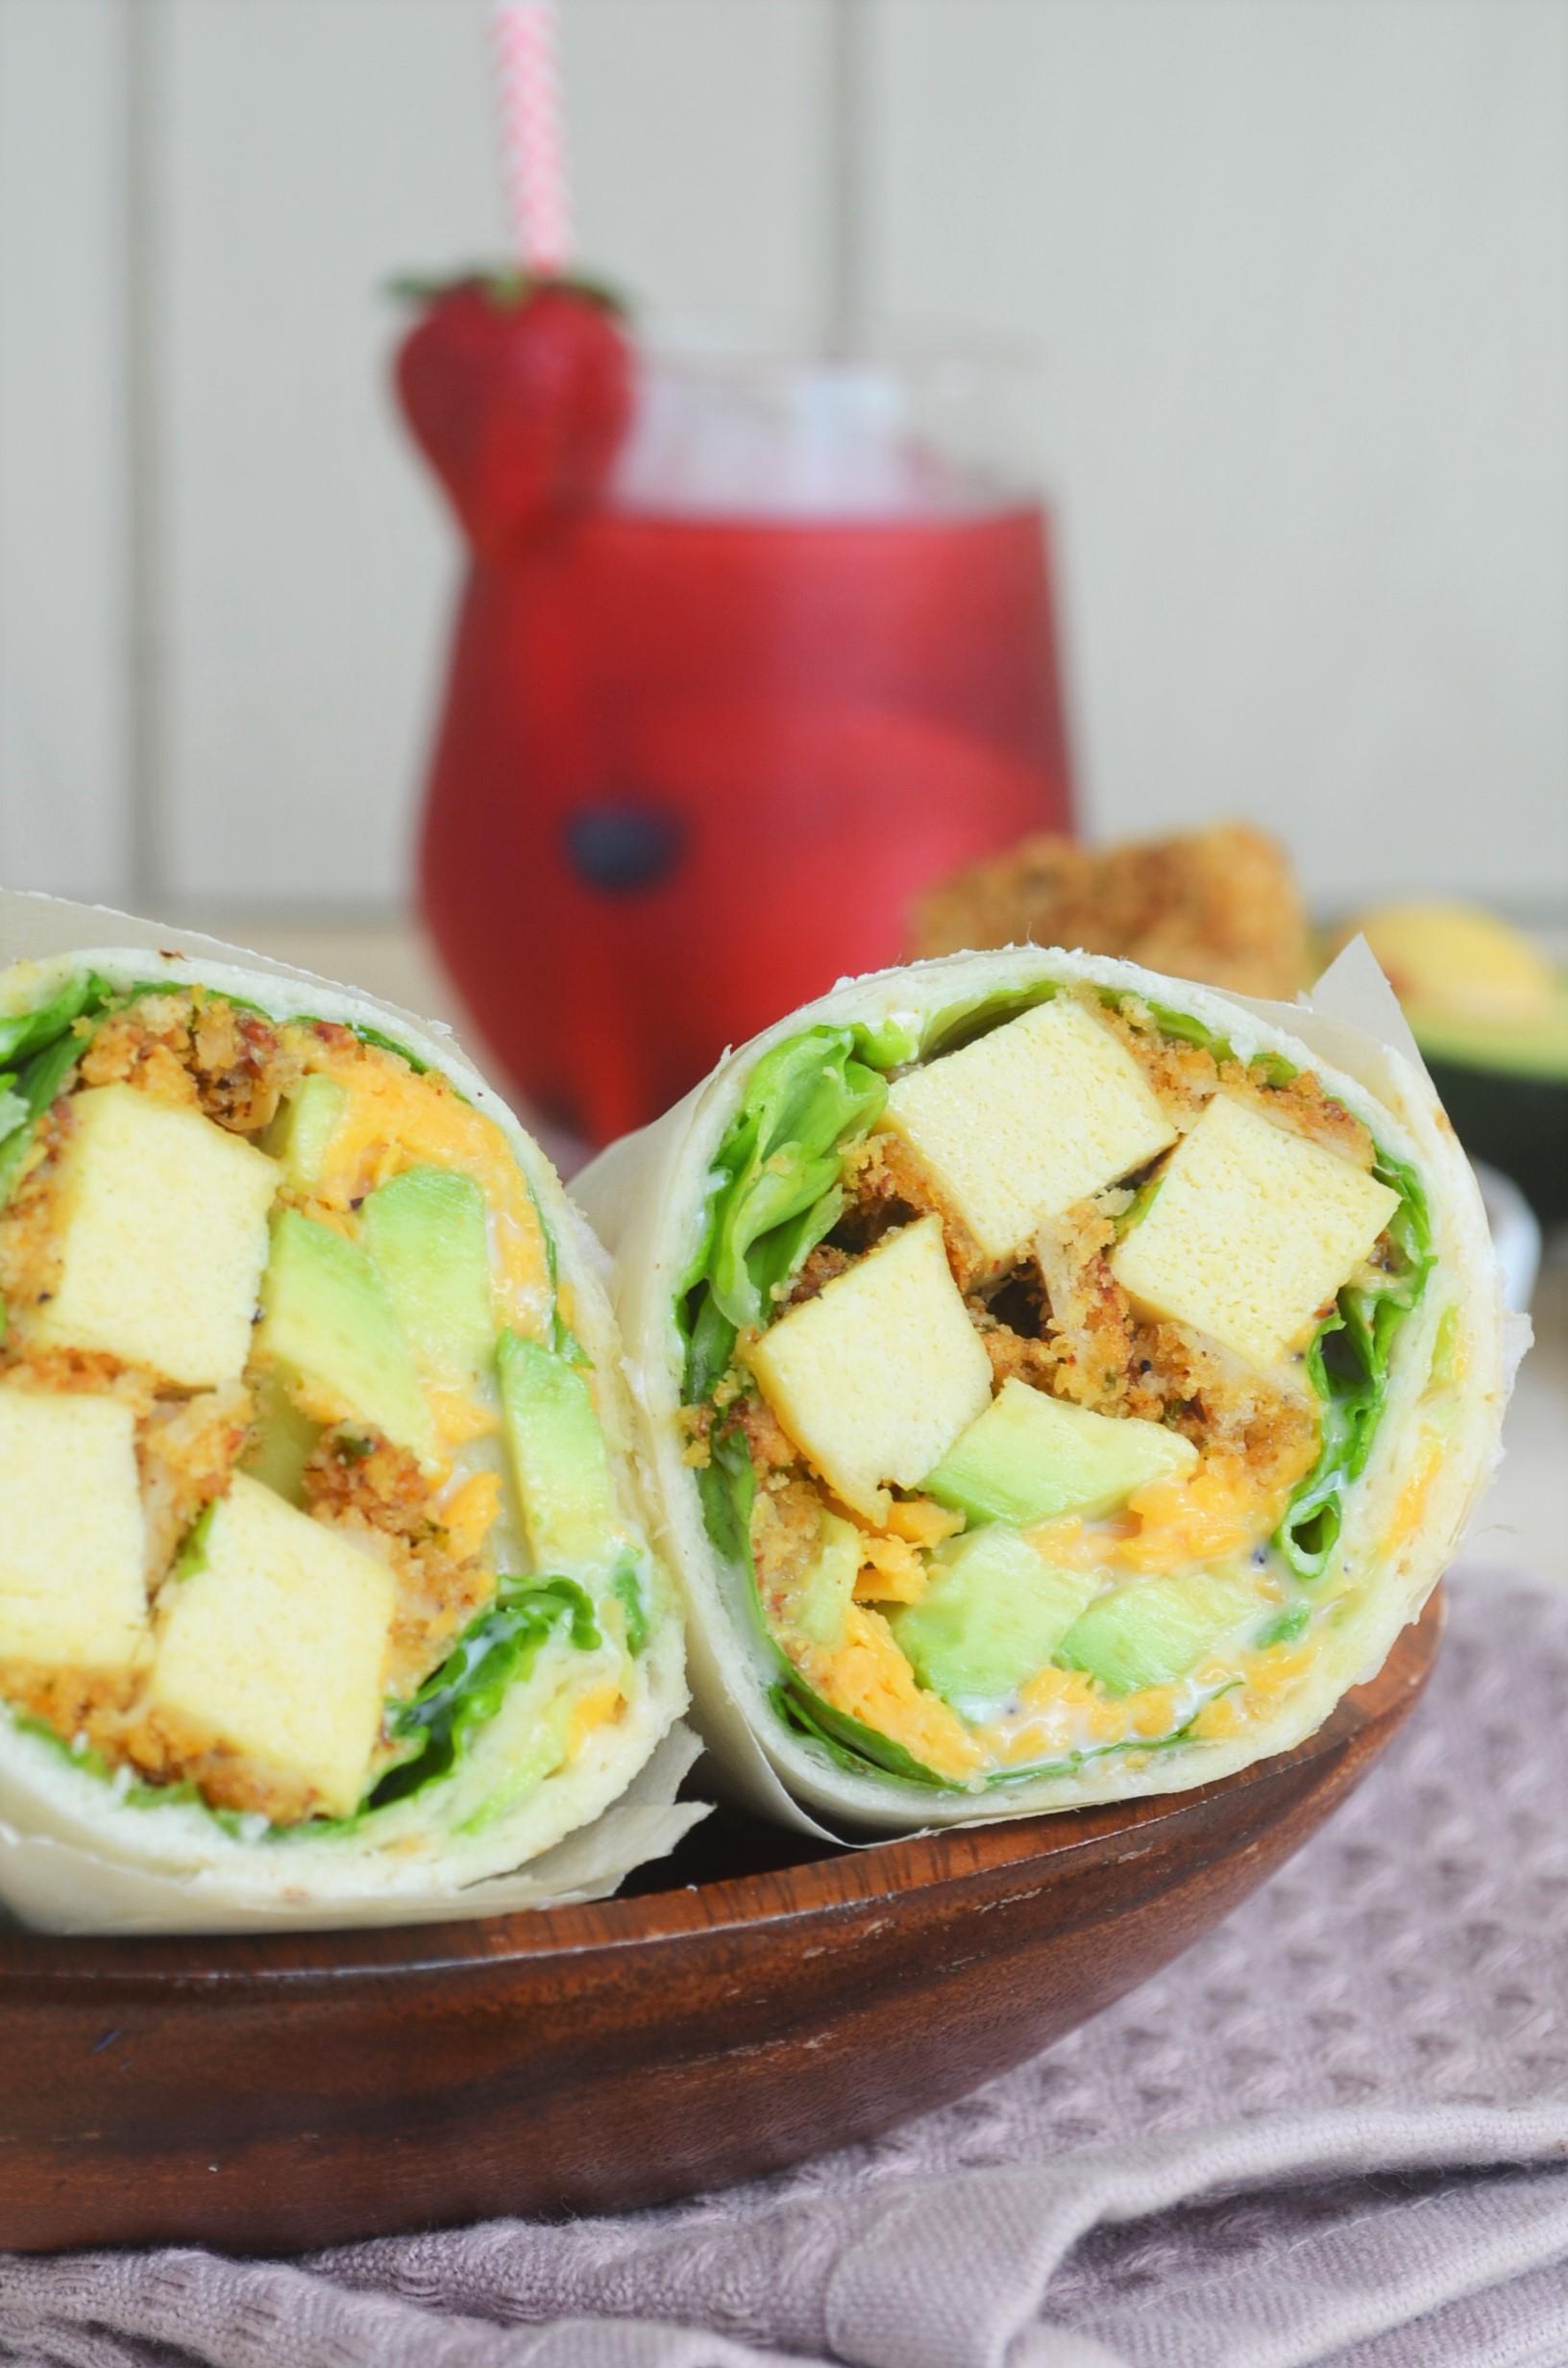 Small Batch Crsipy Tofu Wrap